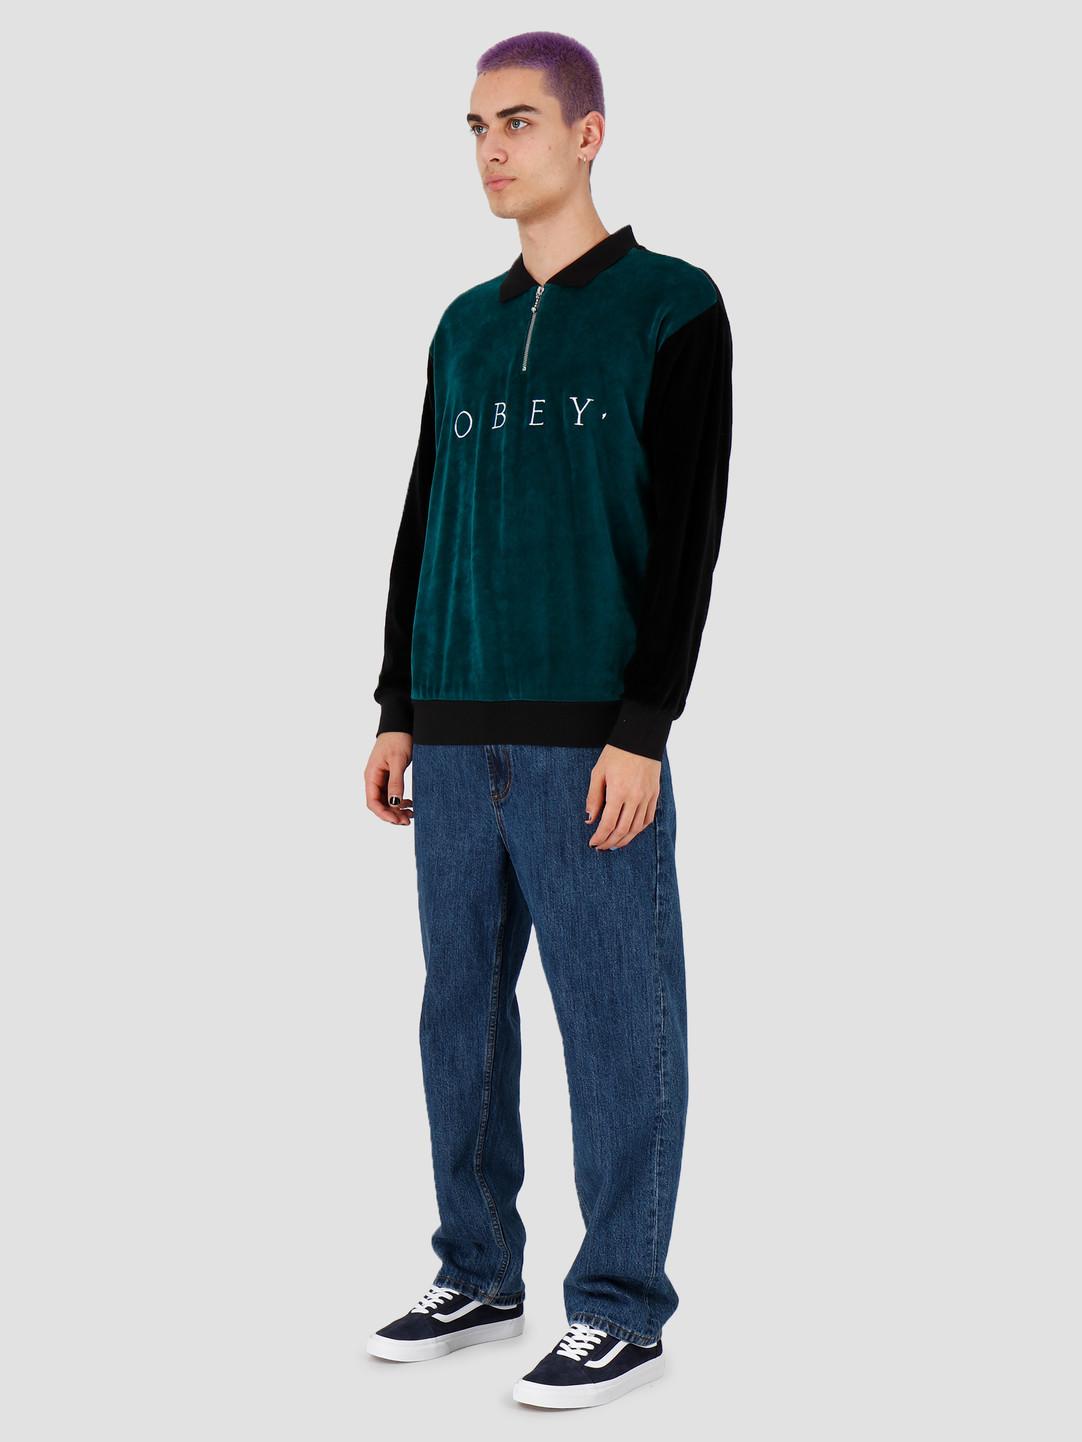 Obey Obey Avenue Zip Polo Ls Black Multi 131040026Bkm